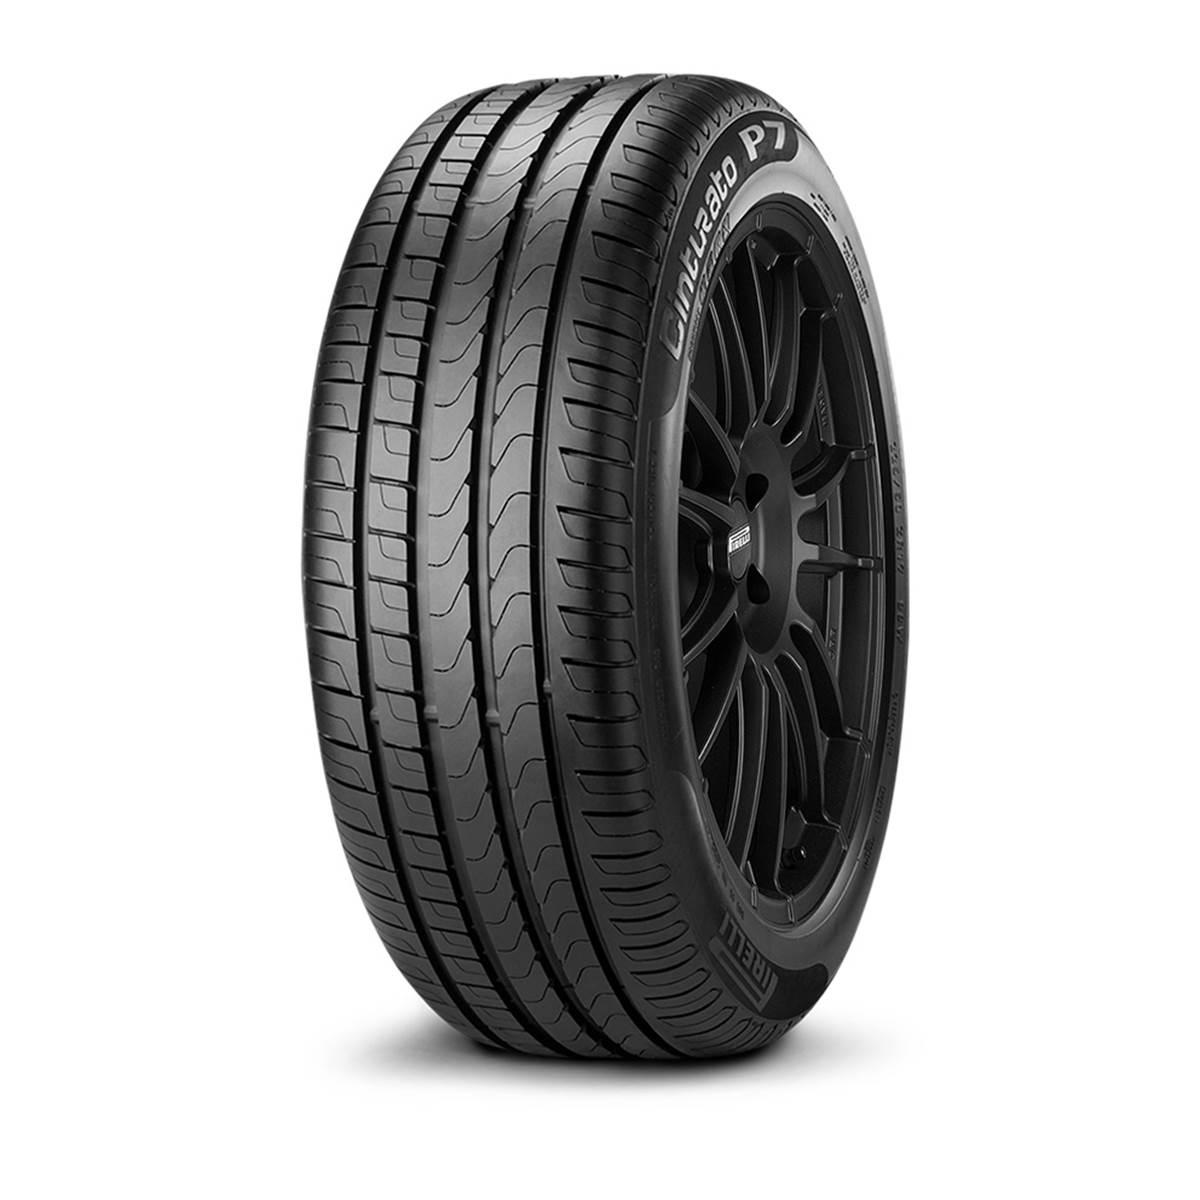 Pneu Pirelli 225/45R18 91W Cinturato P7 homologué Mercedes